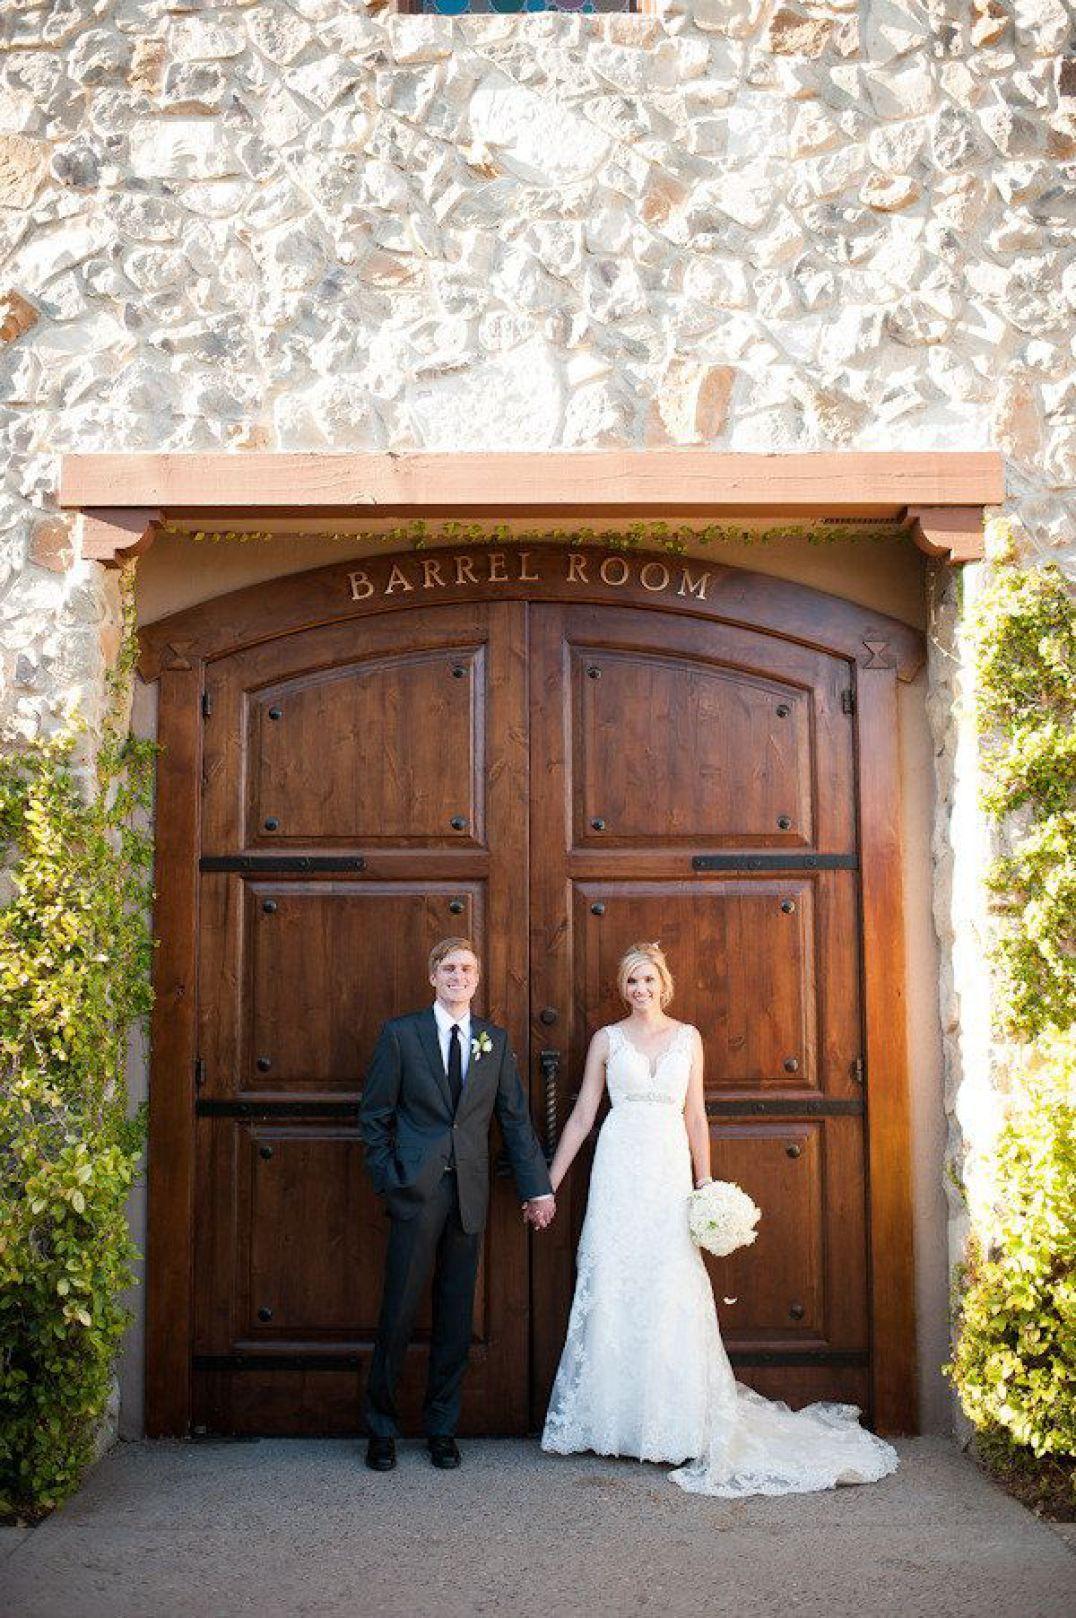 httpsocalweddingconsultantcom Southern California Wedding Planner Bride